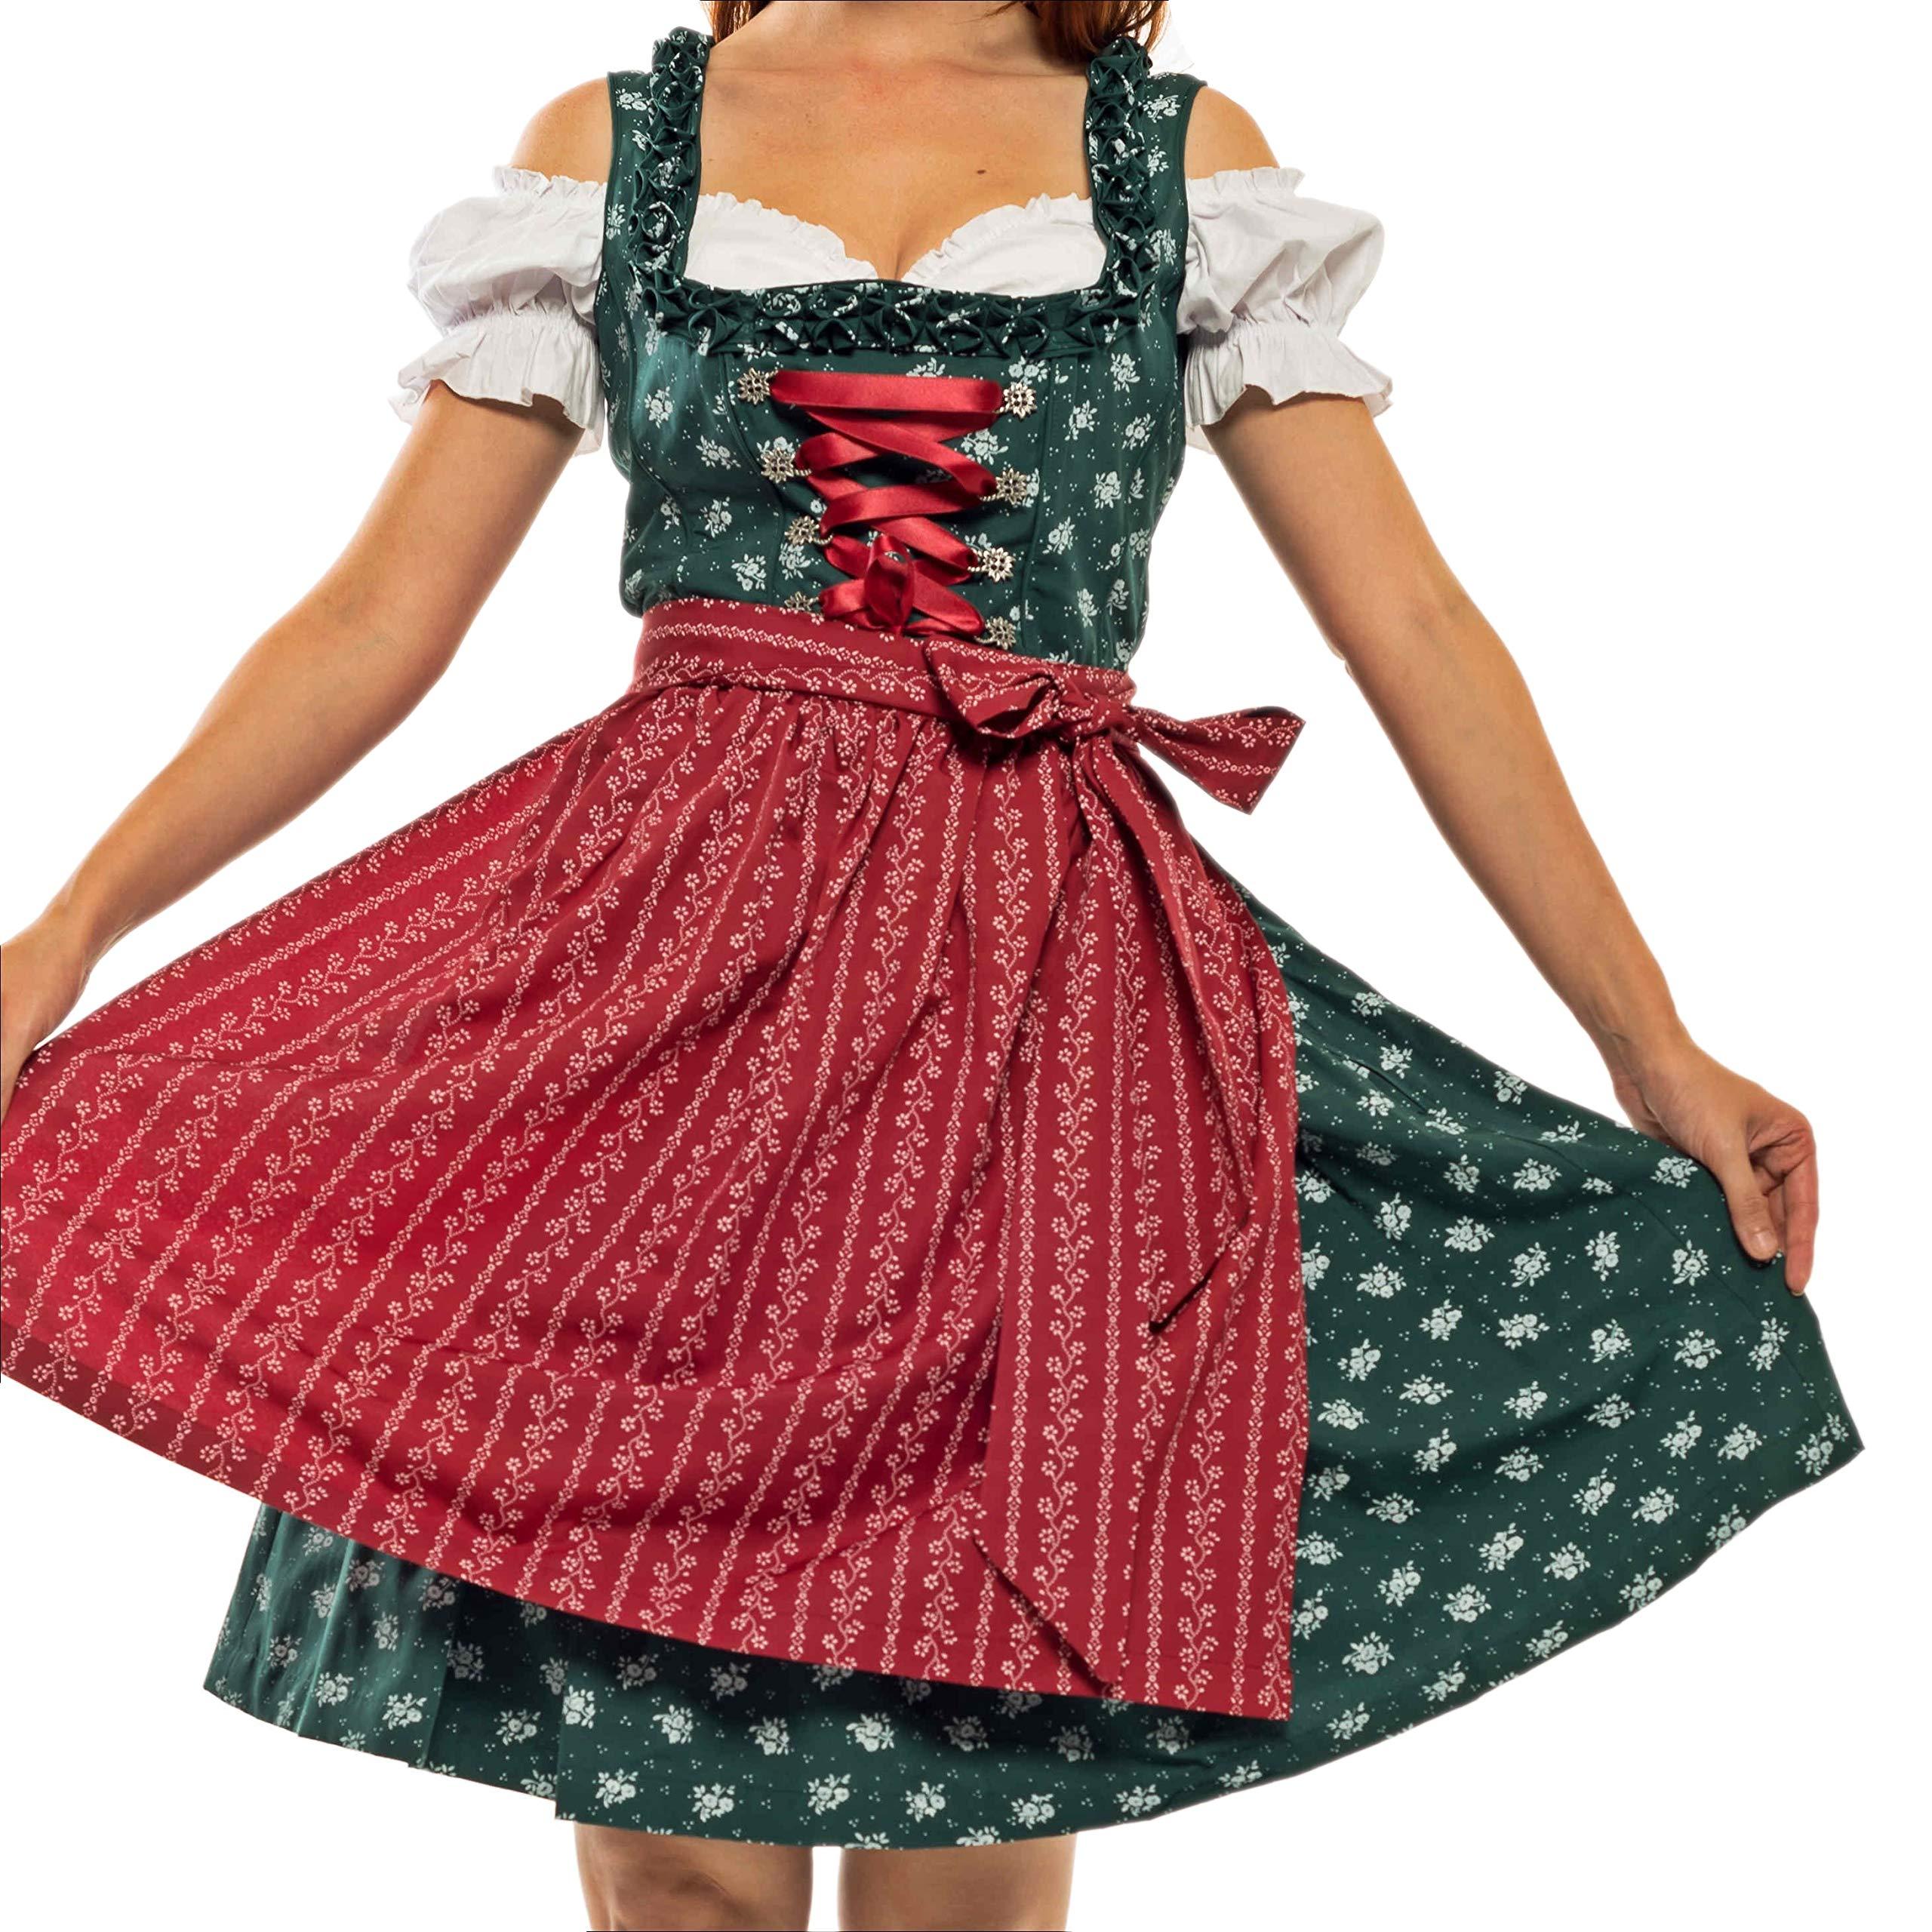 Lifos 0262 Oktoberfest Dirndl 3Pcs Dresses Blouse Apron (44) Green by Lifos